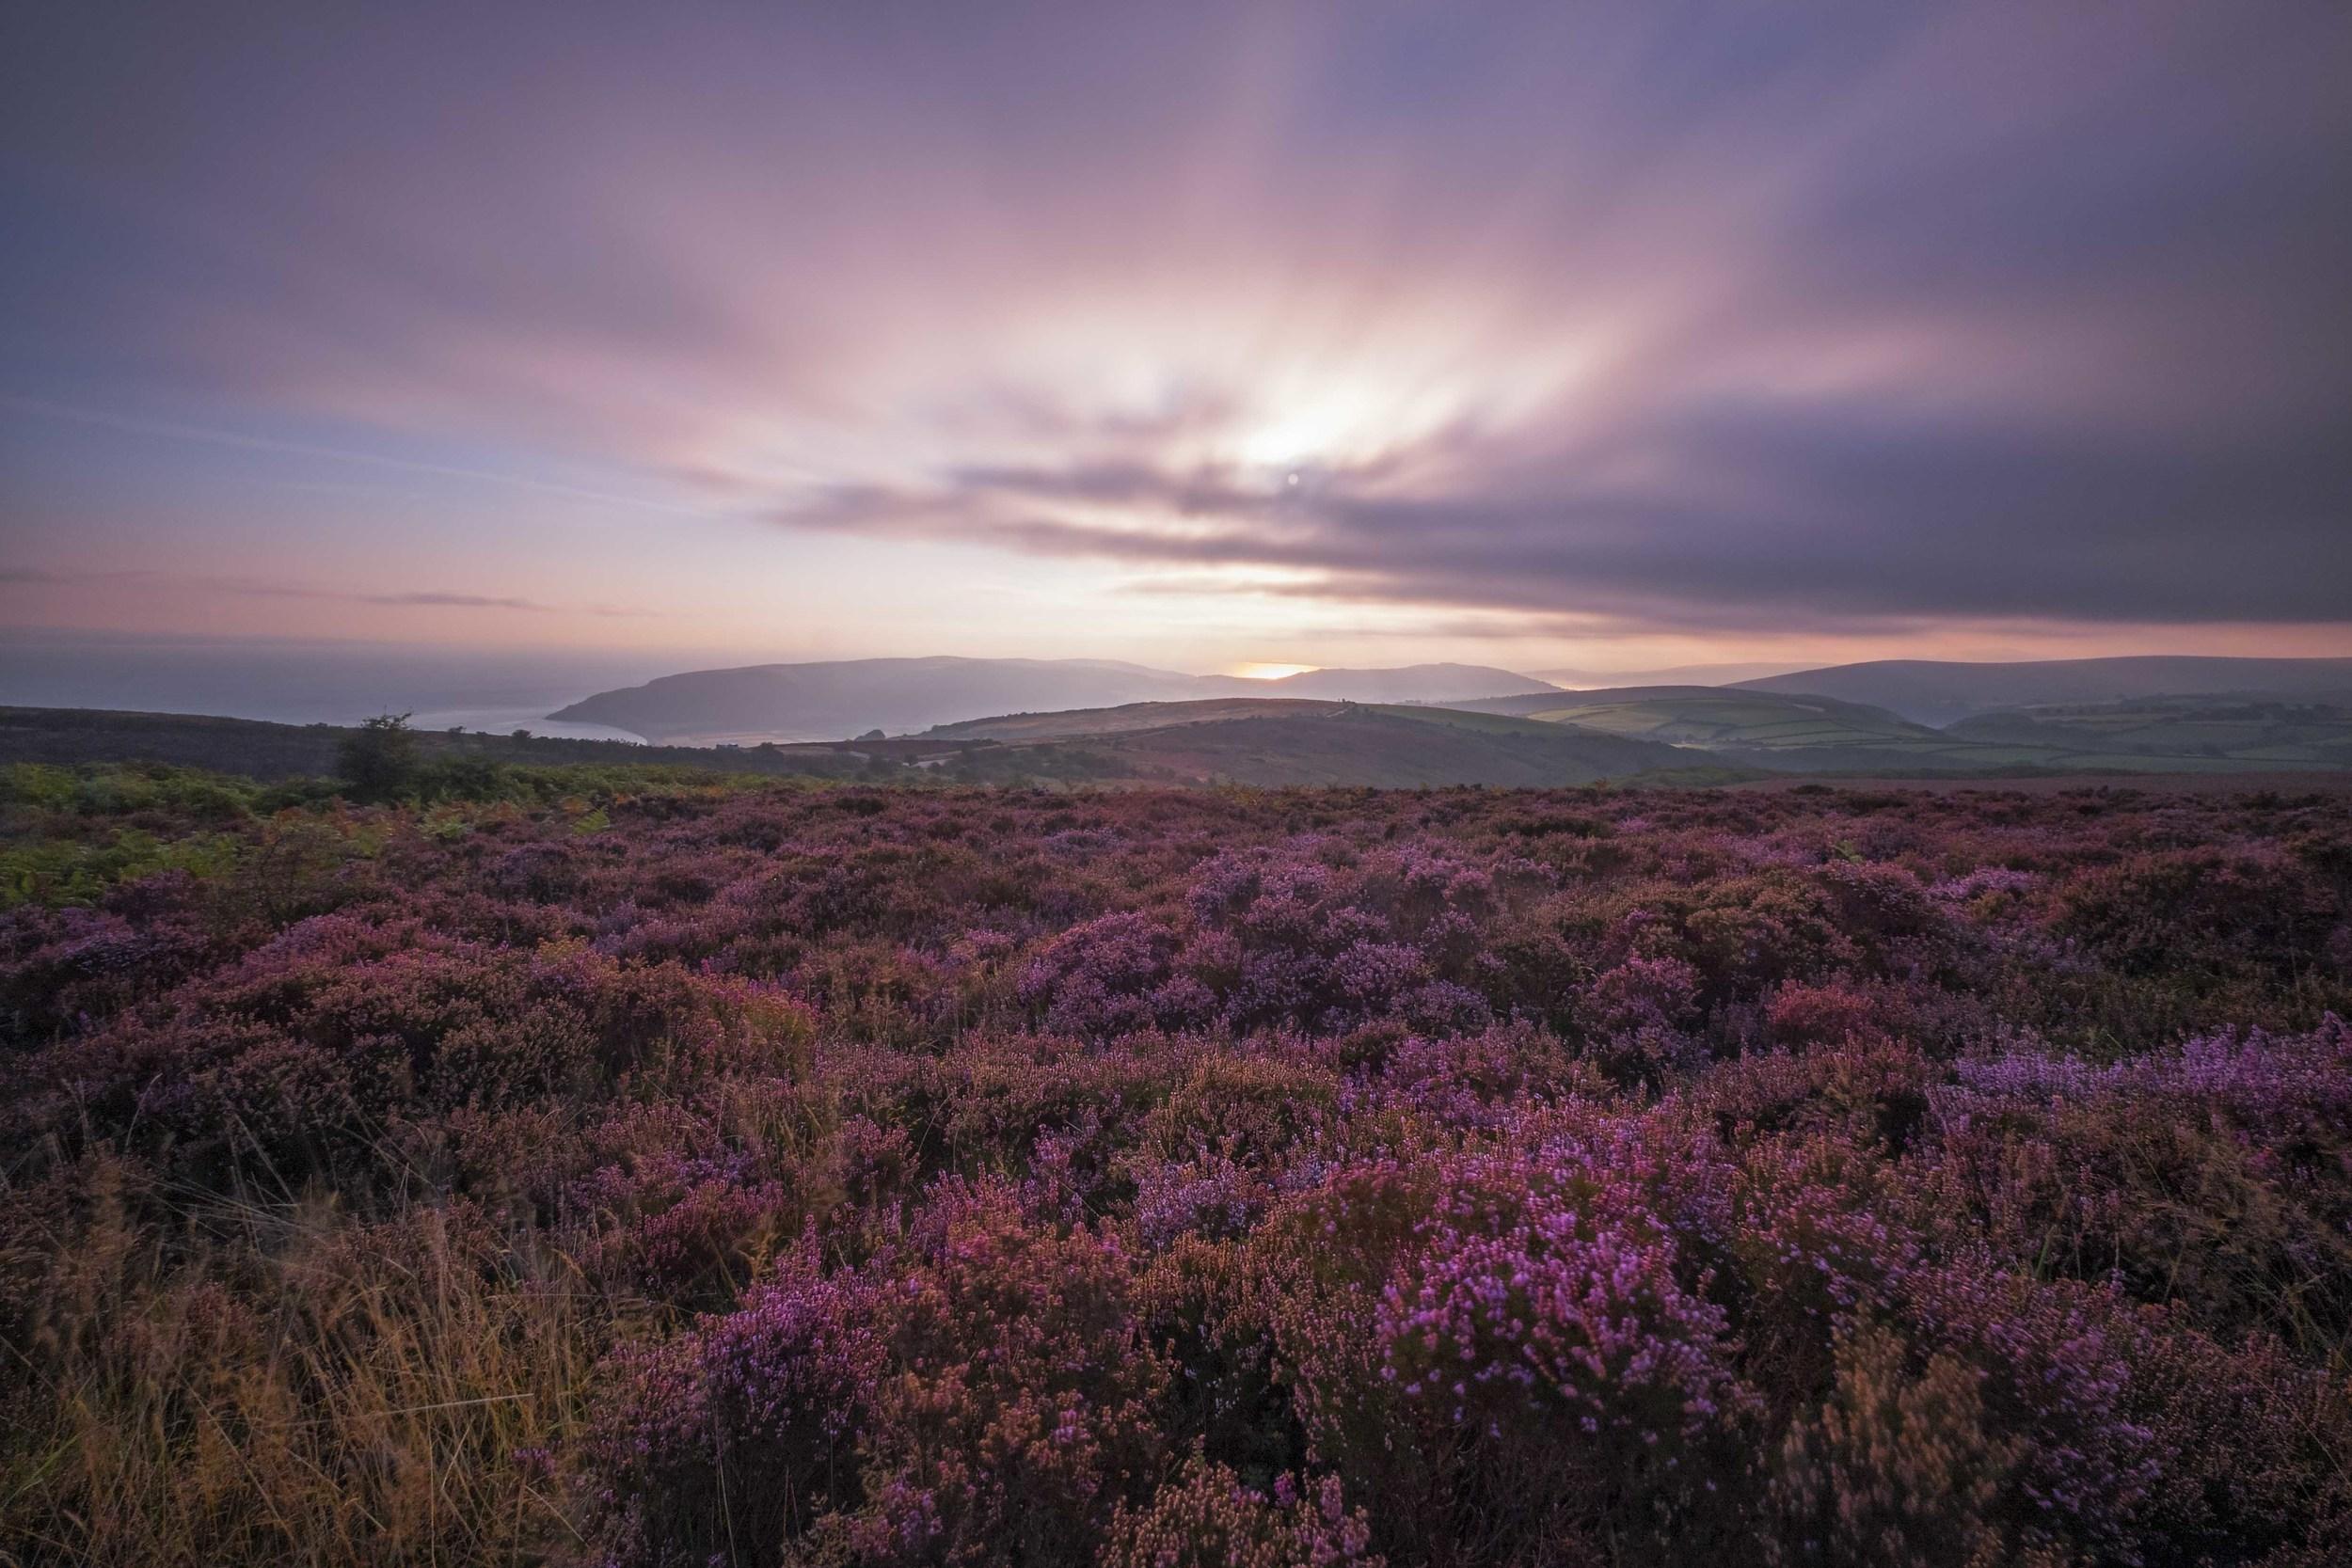 """Purple Haze"" - Exmoor, Devon, England Fujifilm X-T1 + 10-24mm f/4 OIS @ f/10. 20 Seconds."